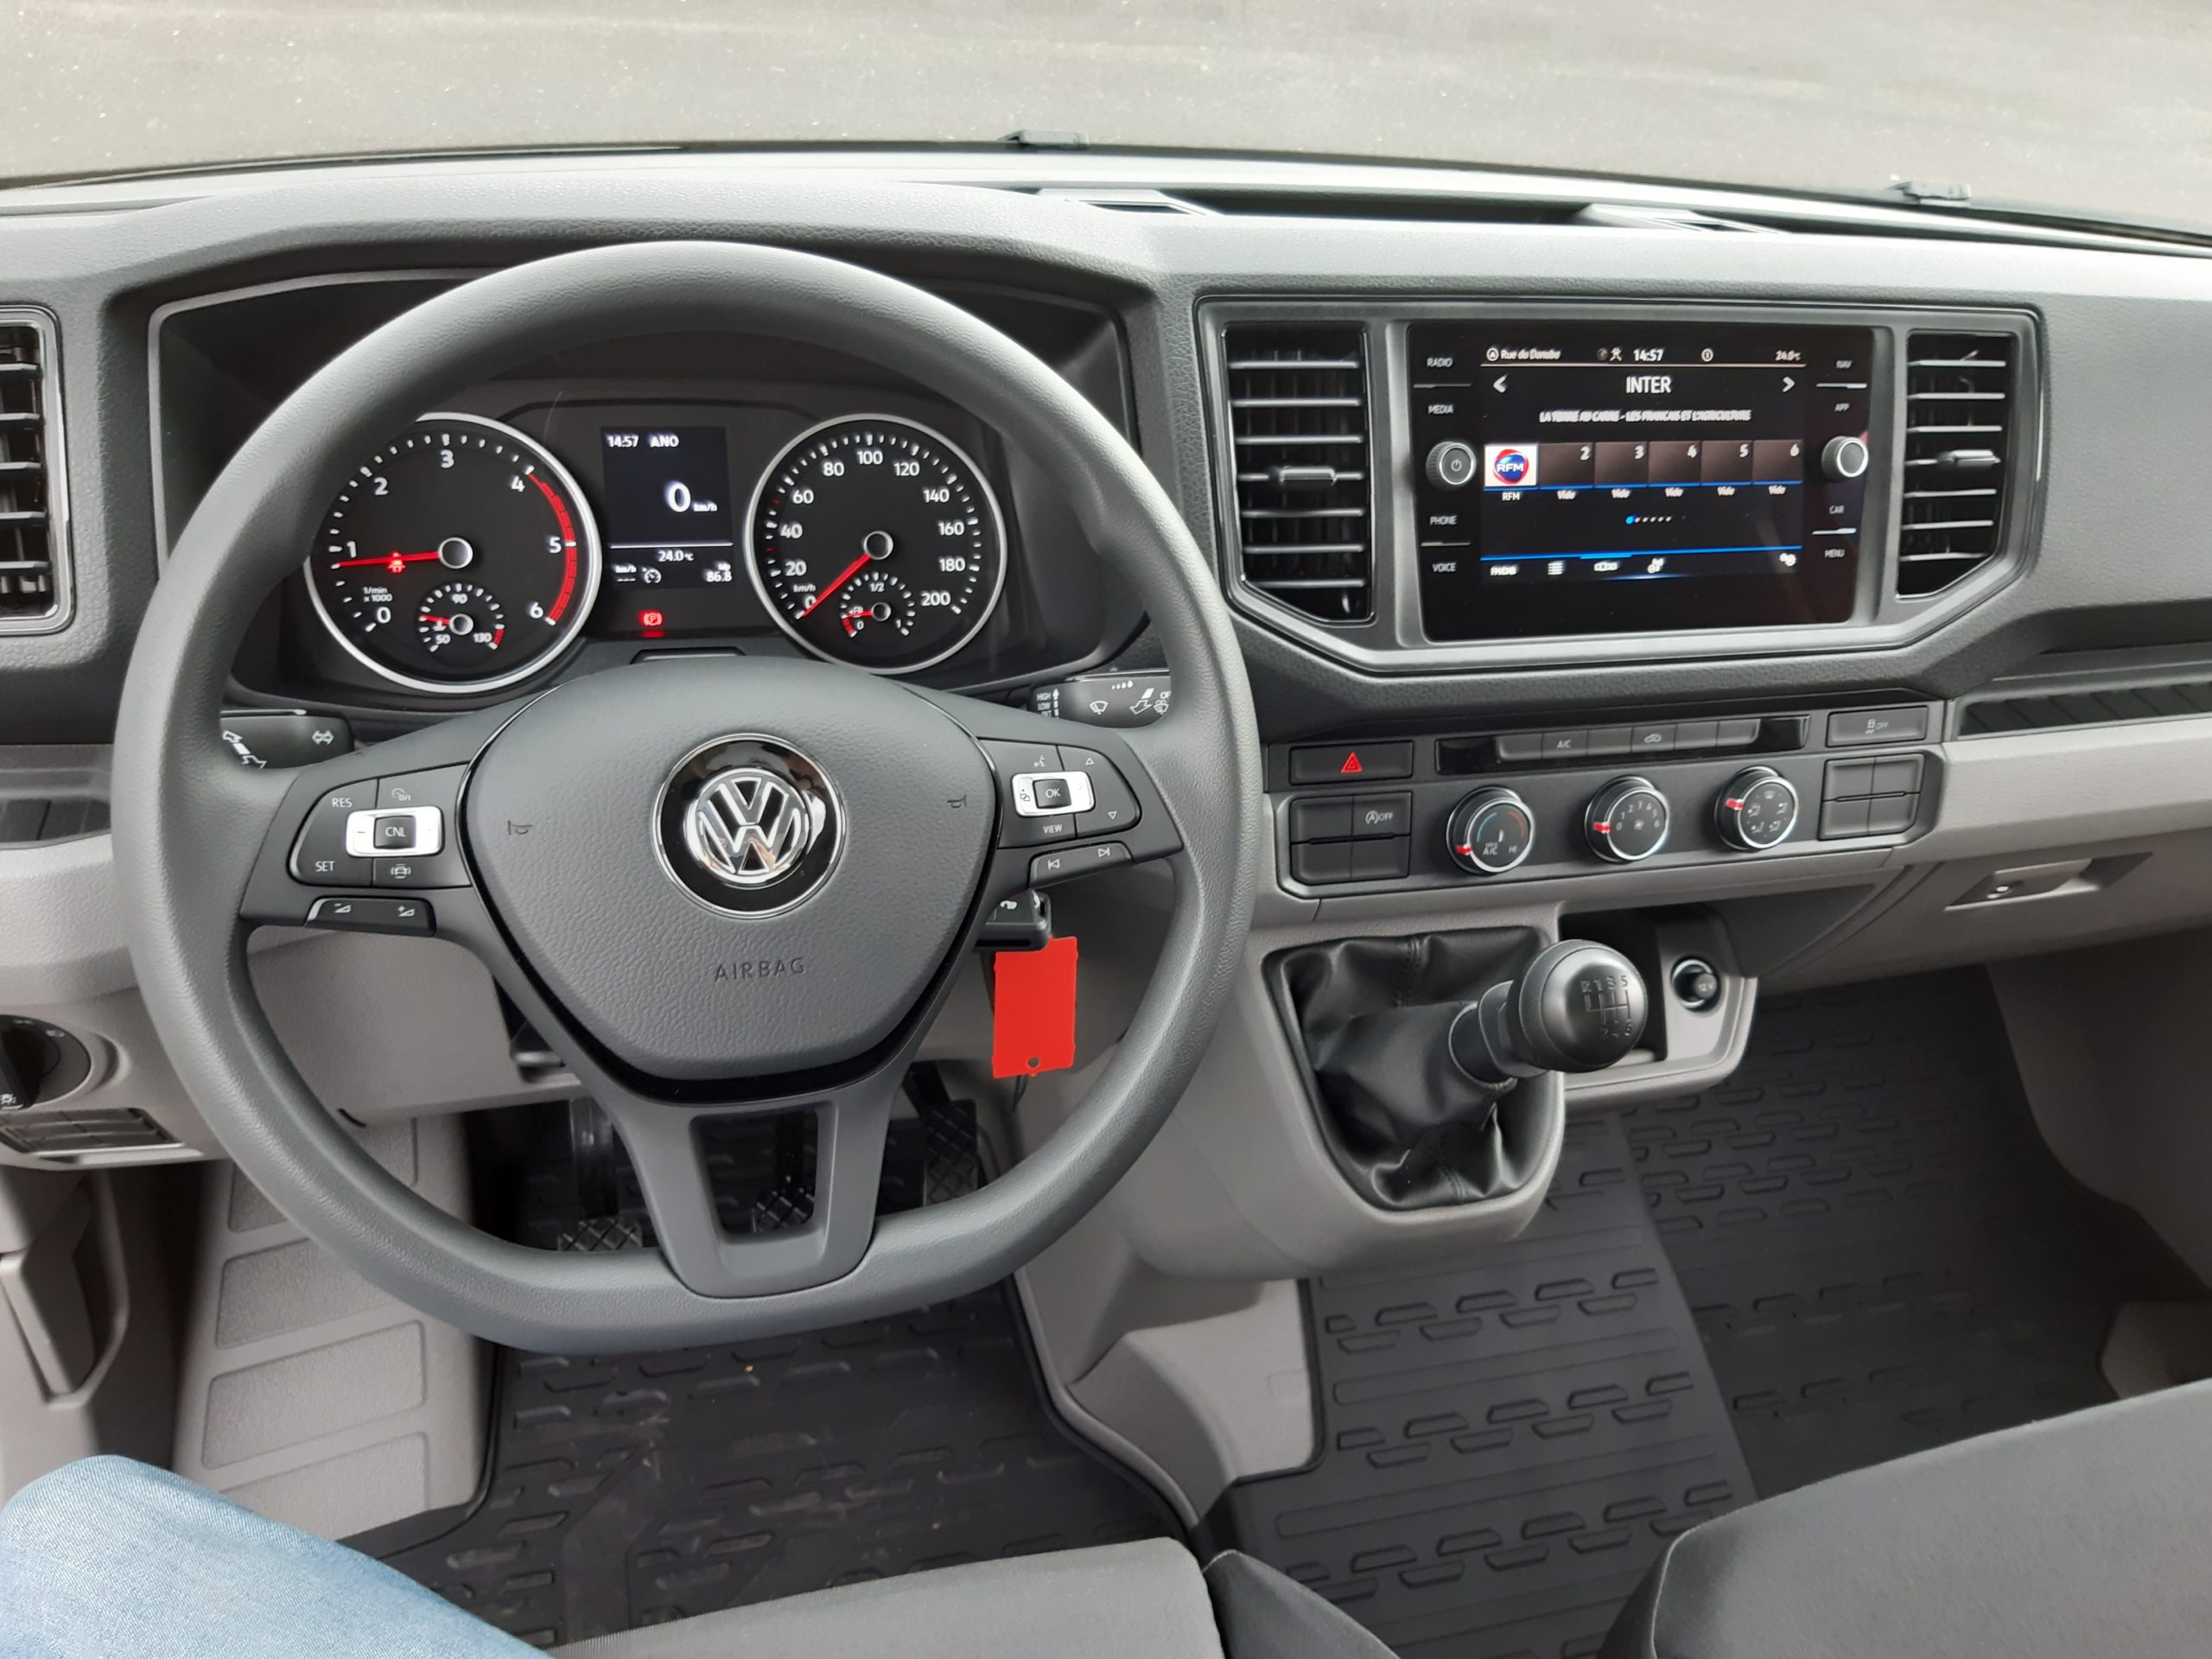 Location d'un utilitaire benne - Volkswagen Crafter benne et coffre - Vue8